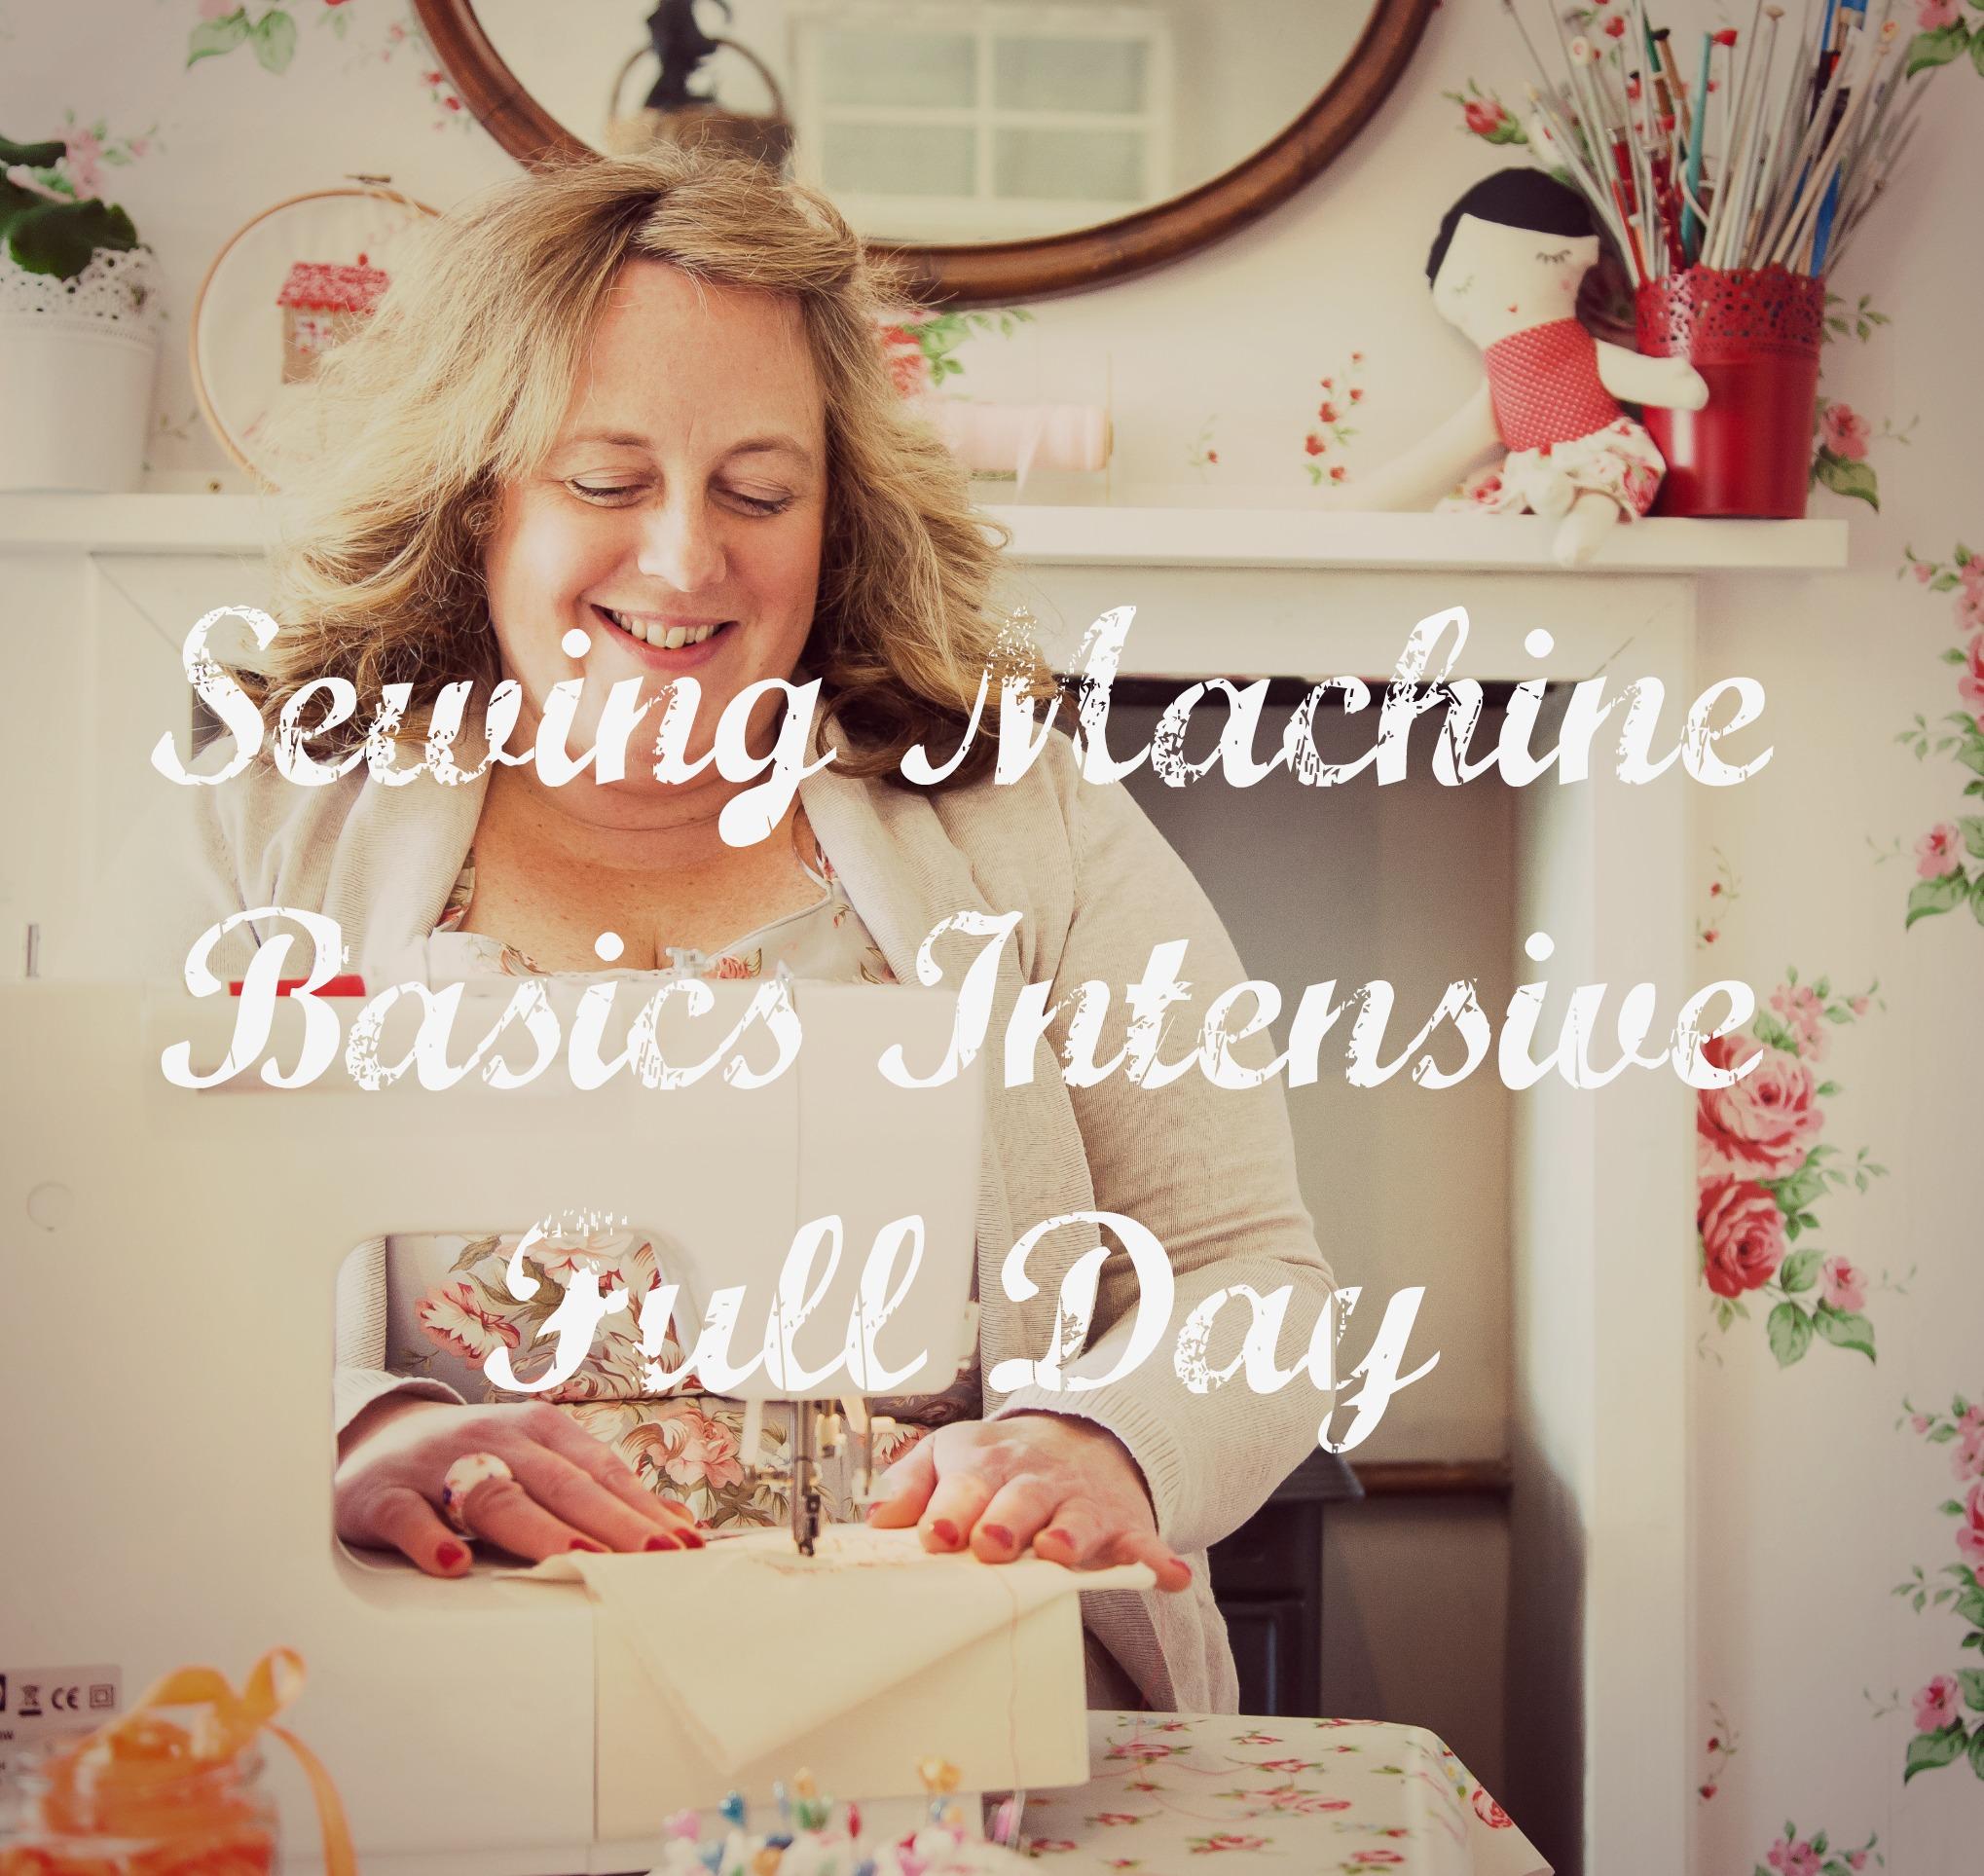 mmt Sewing Basics Full Day